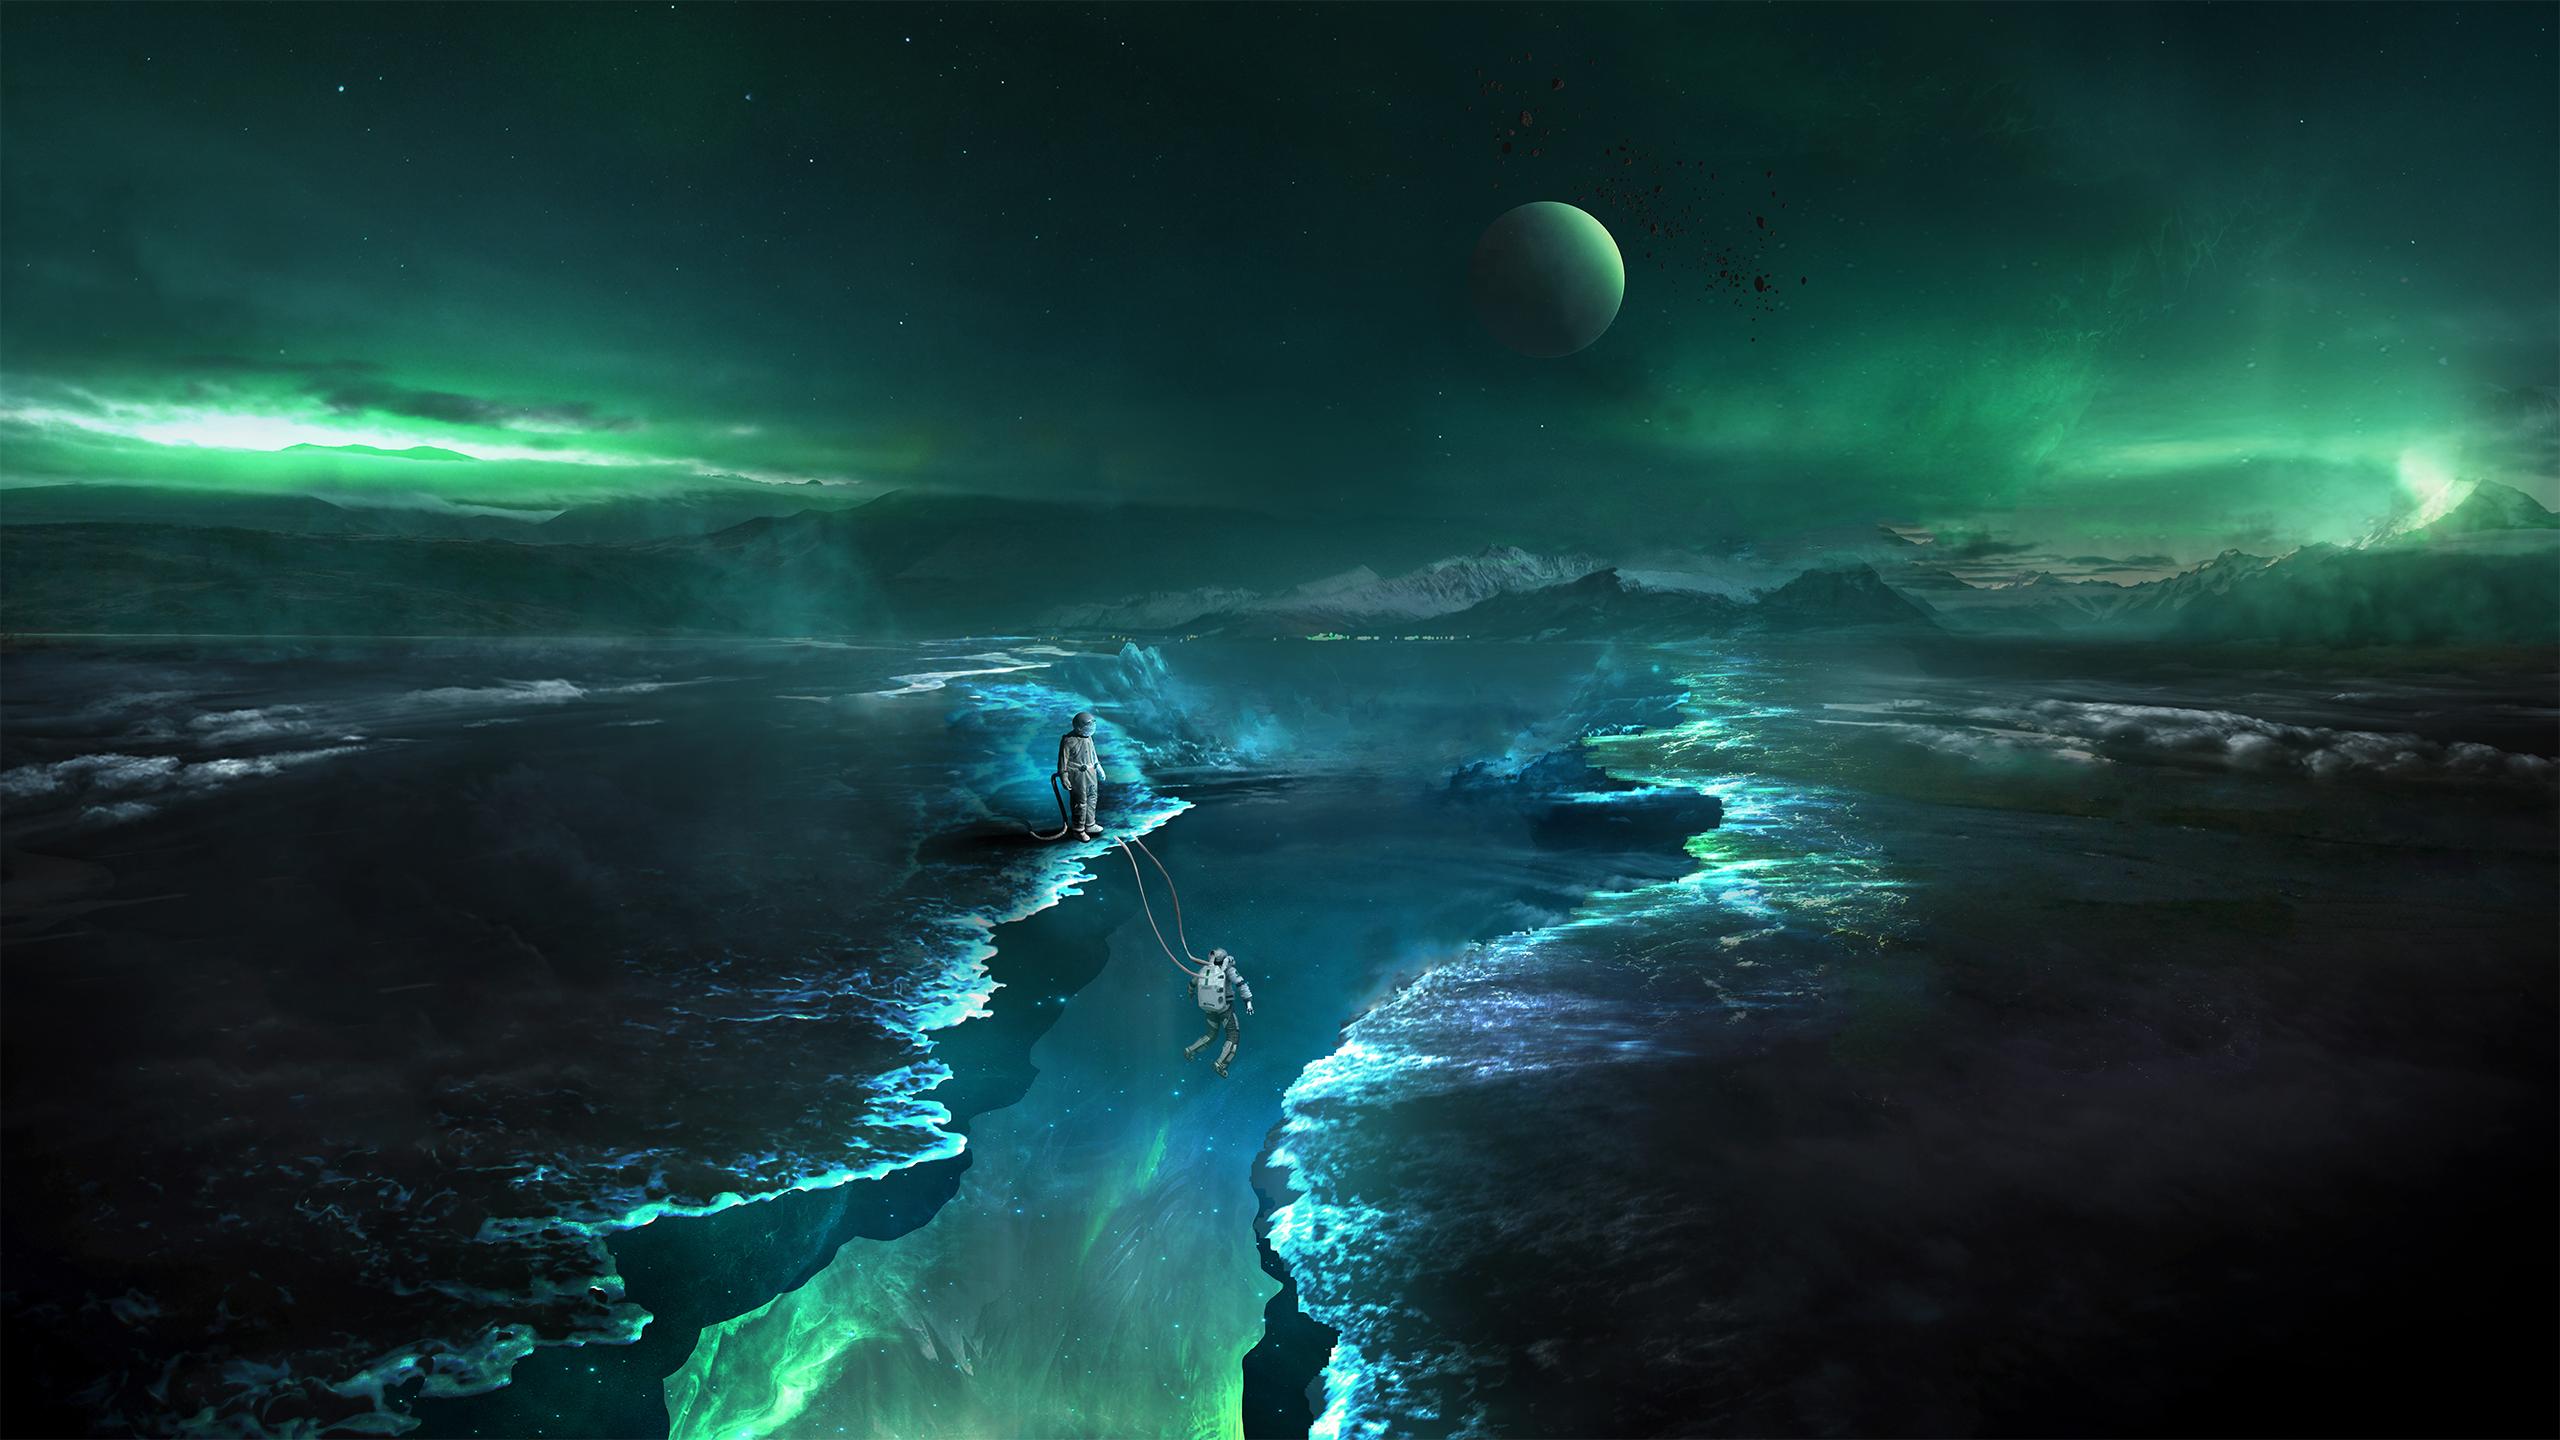 Astronaut Space Digital Art Fantasy, HD Artist, 4k ...